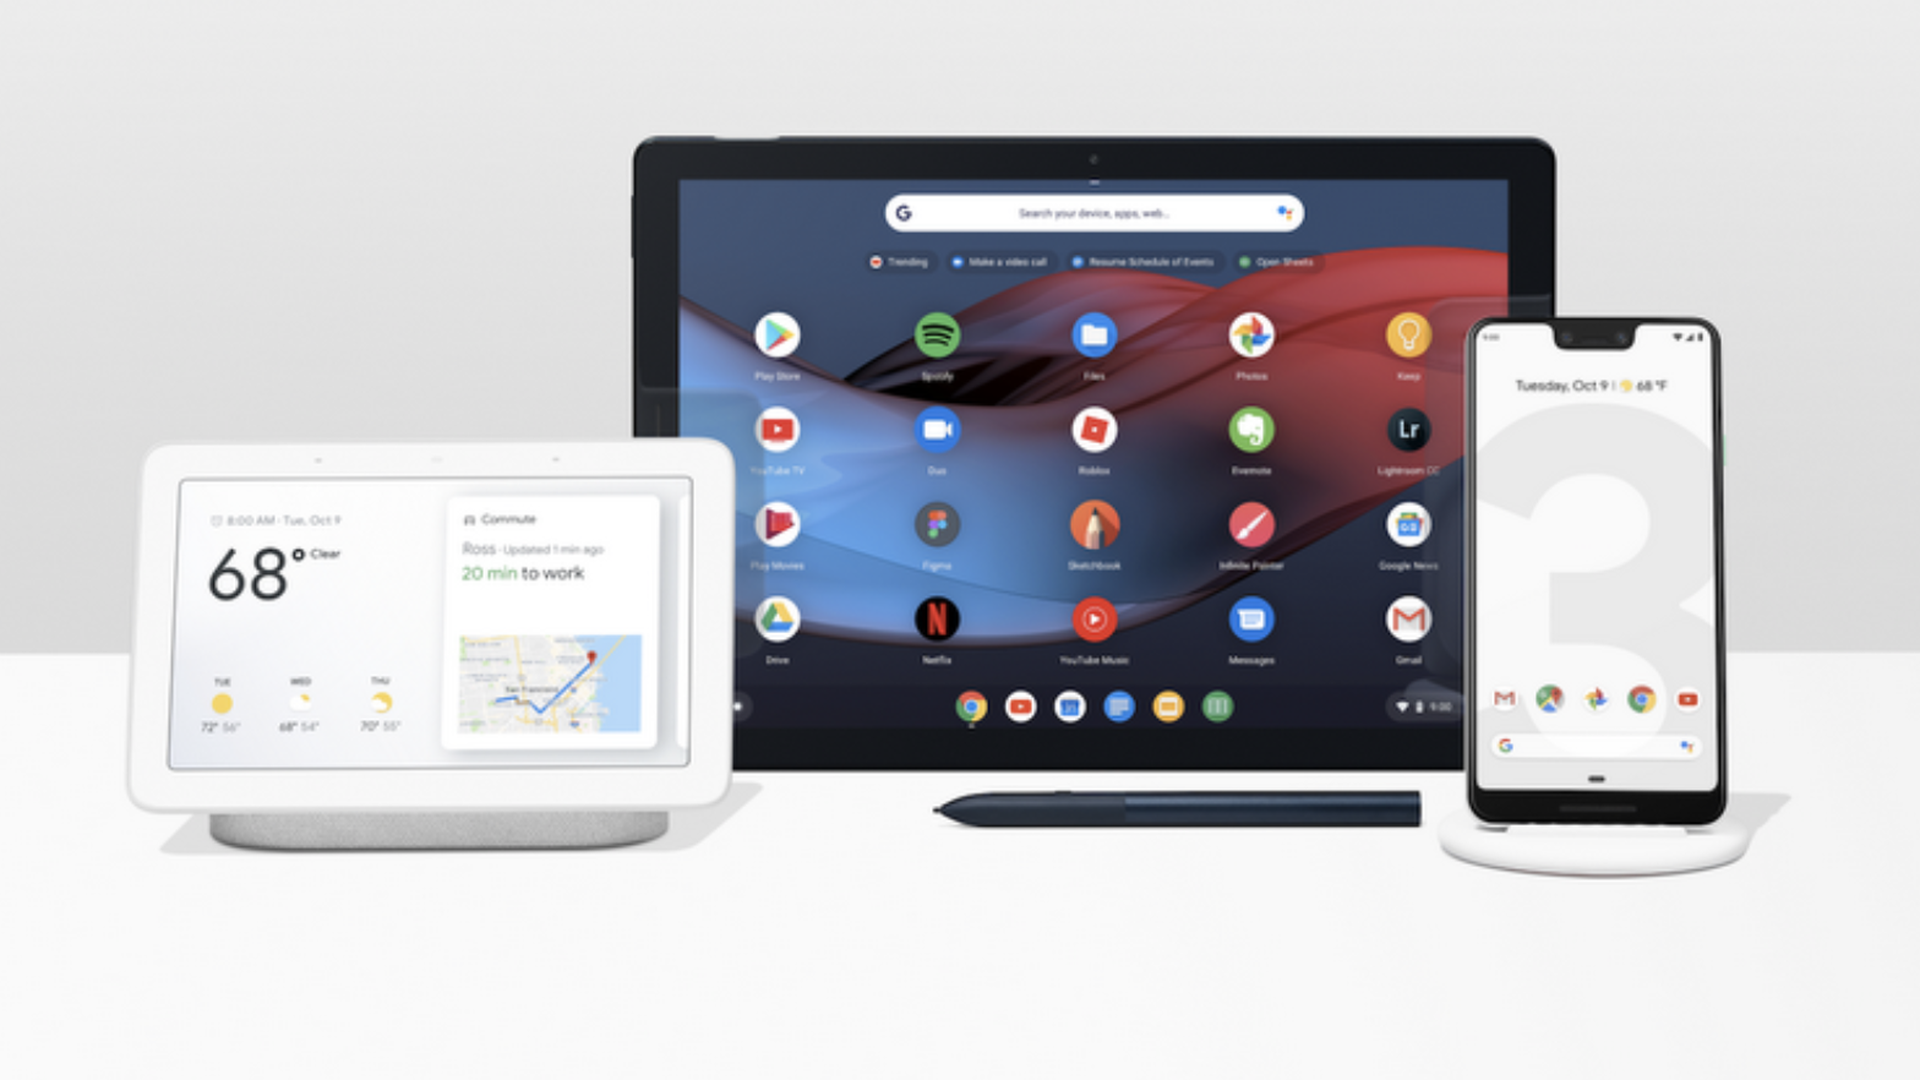 Google's new hardware lineup: Pixel 3, Google Home Hub, Pixel Slate